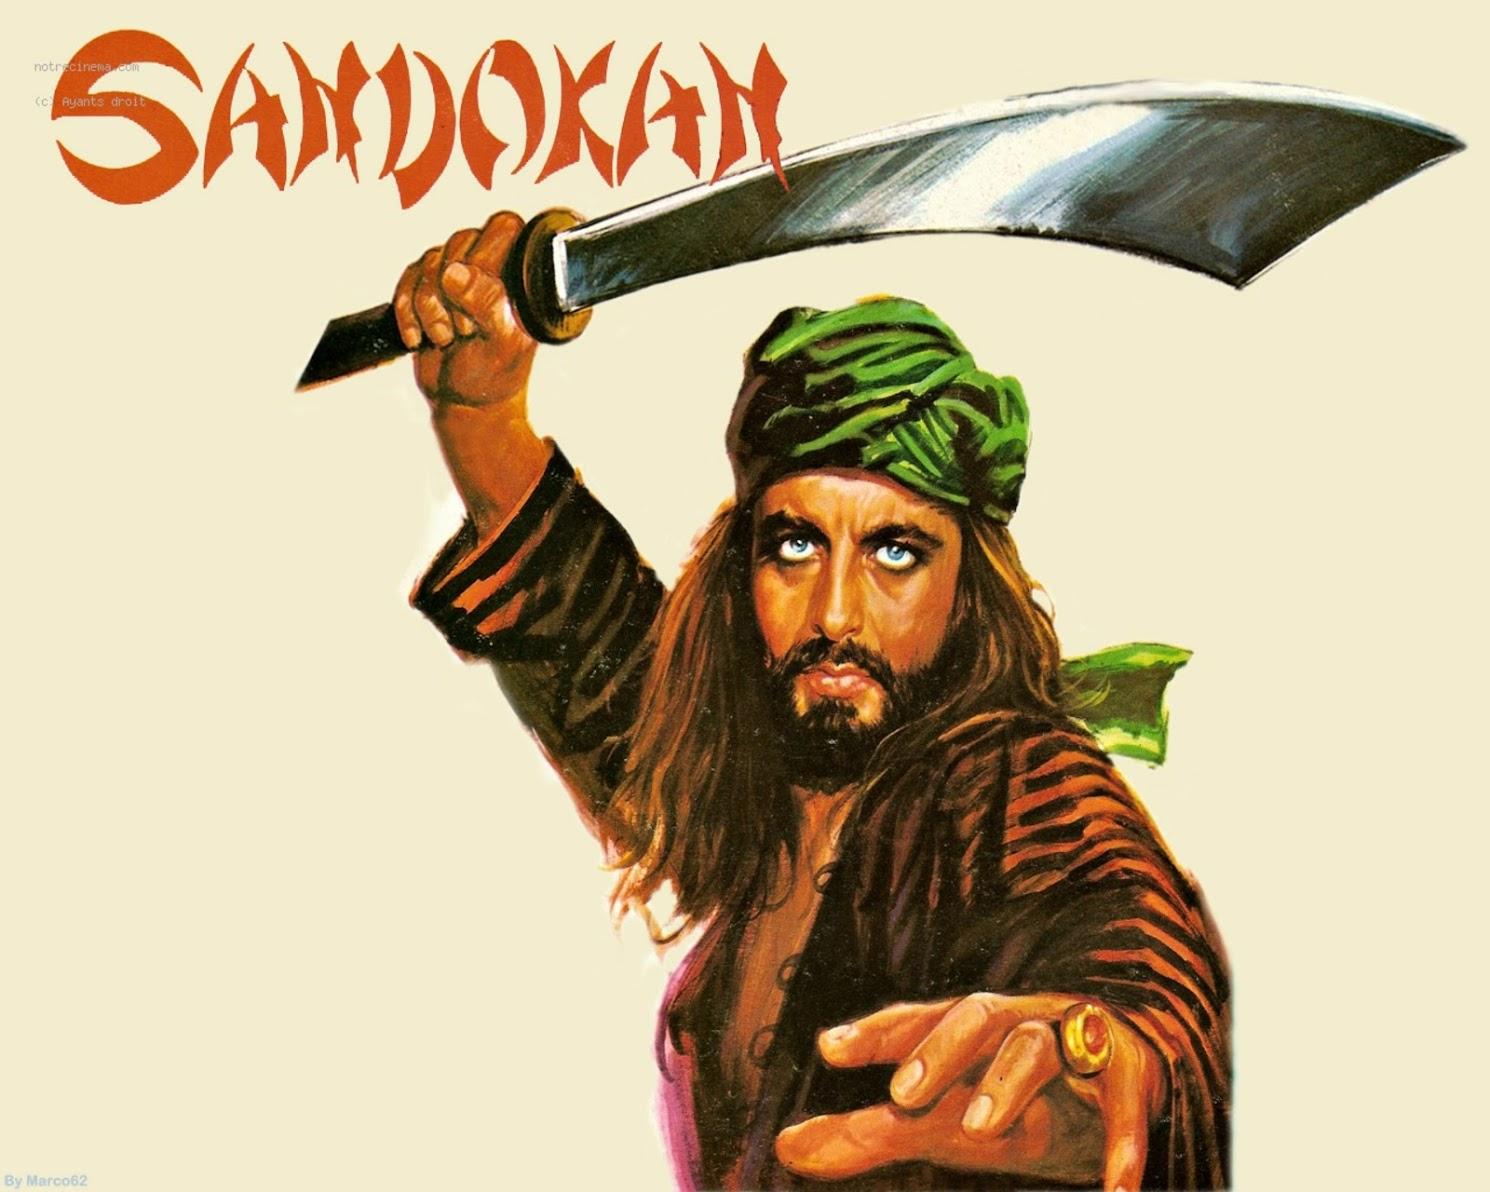 SANDOKAN 20